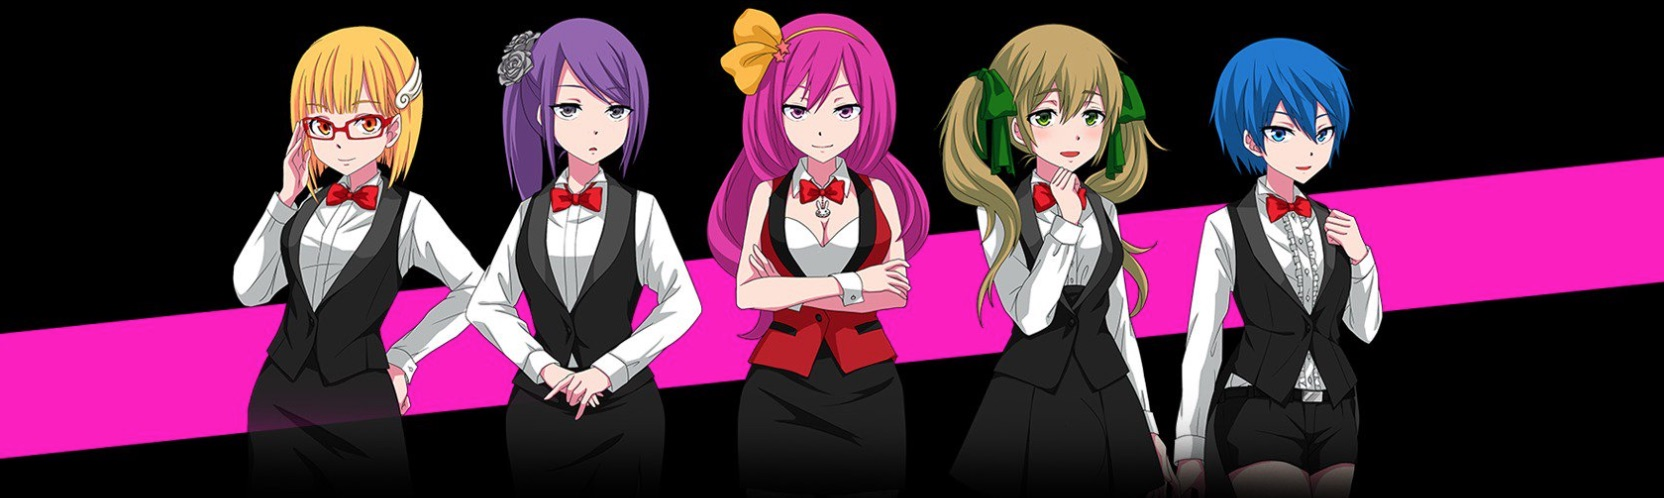 Lucky Niki Casino team på fem piger